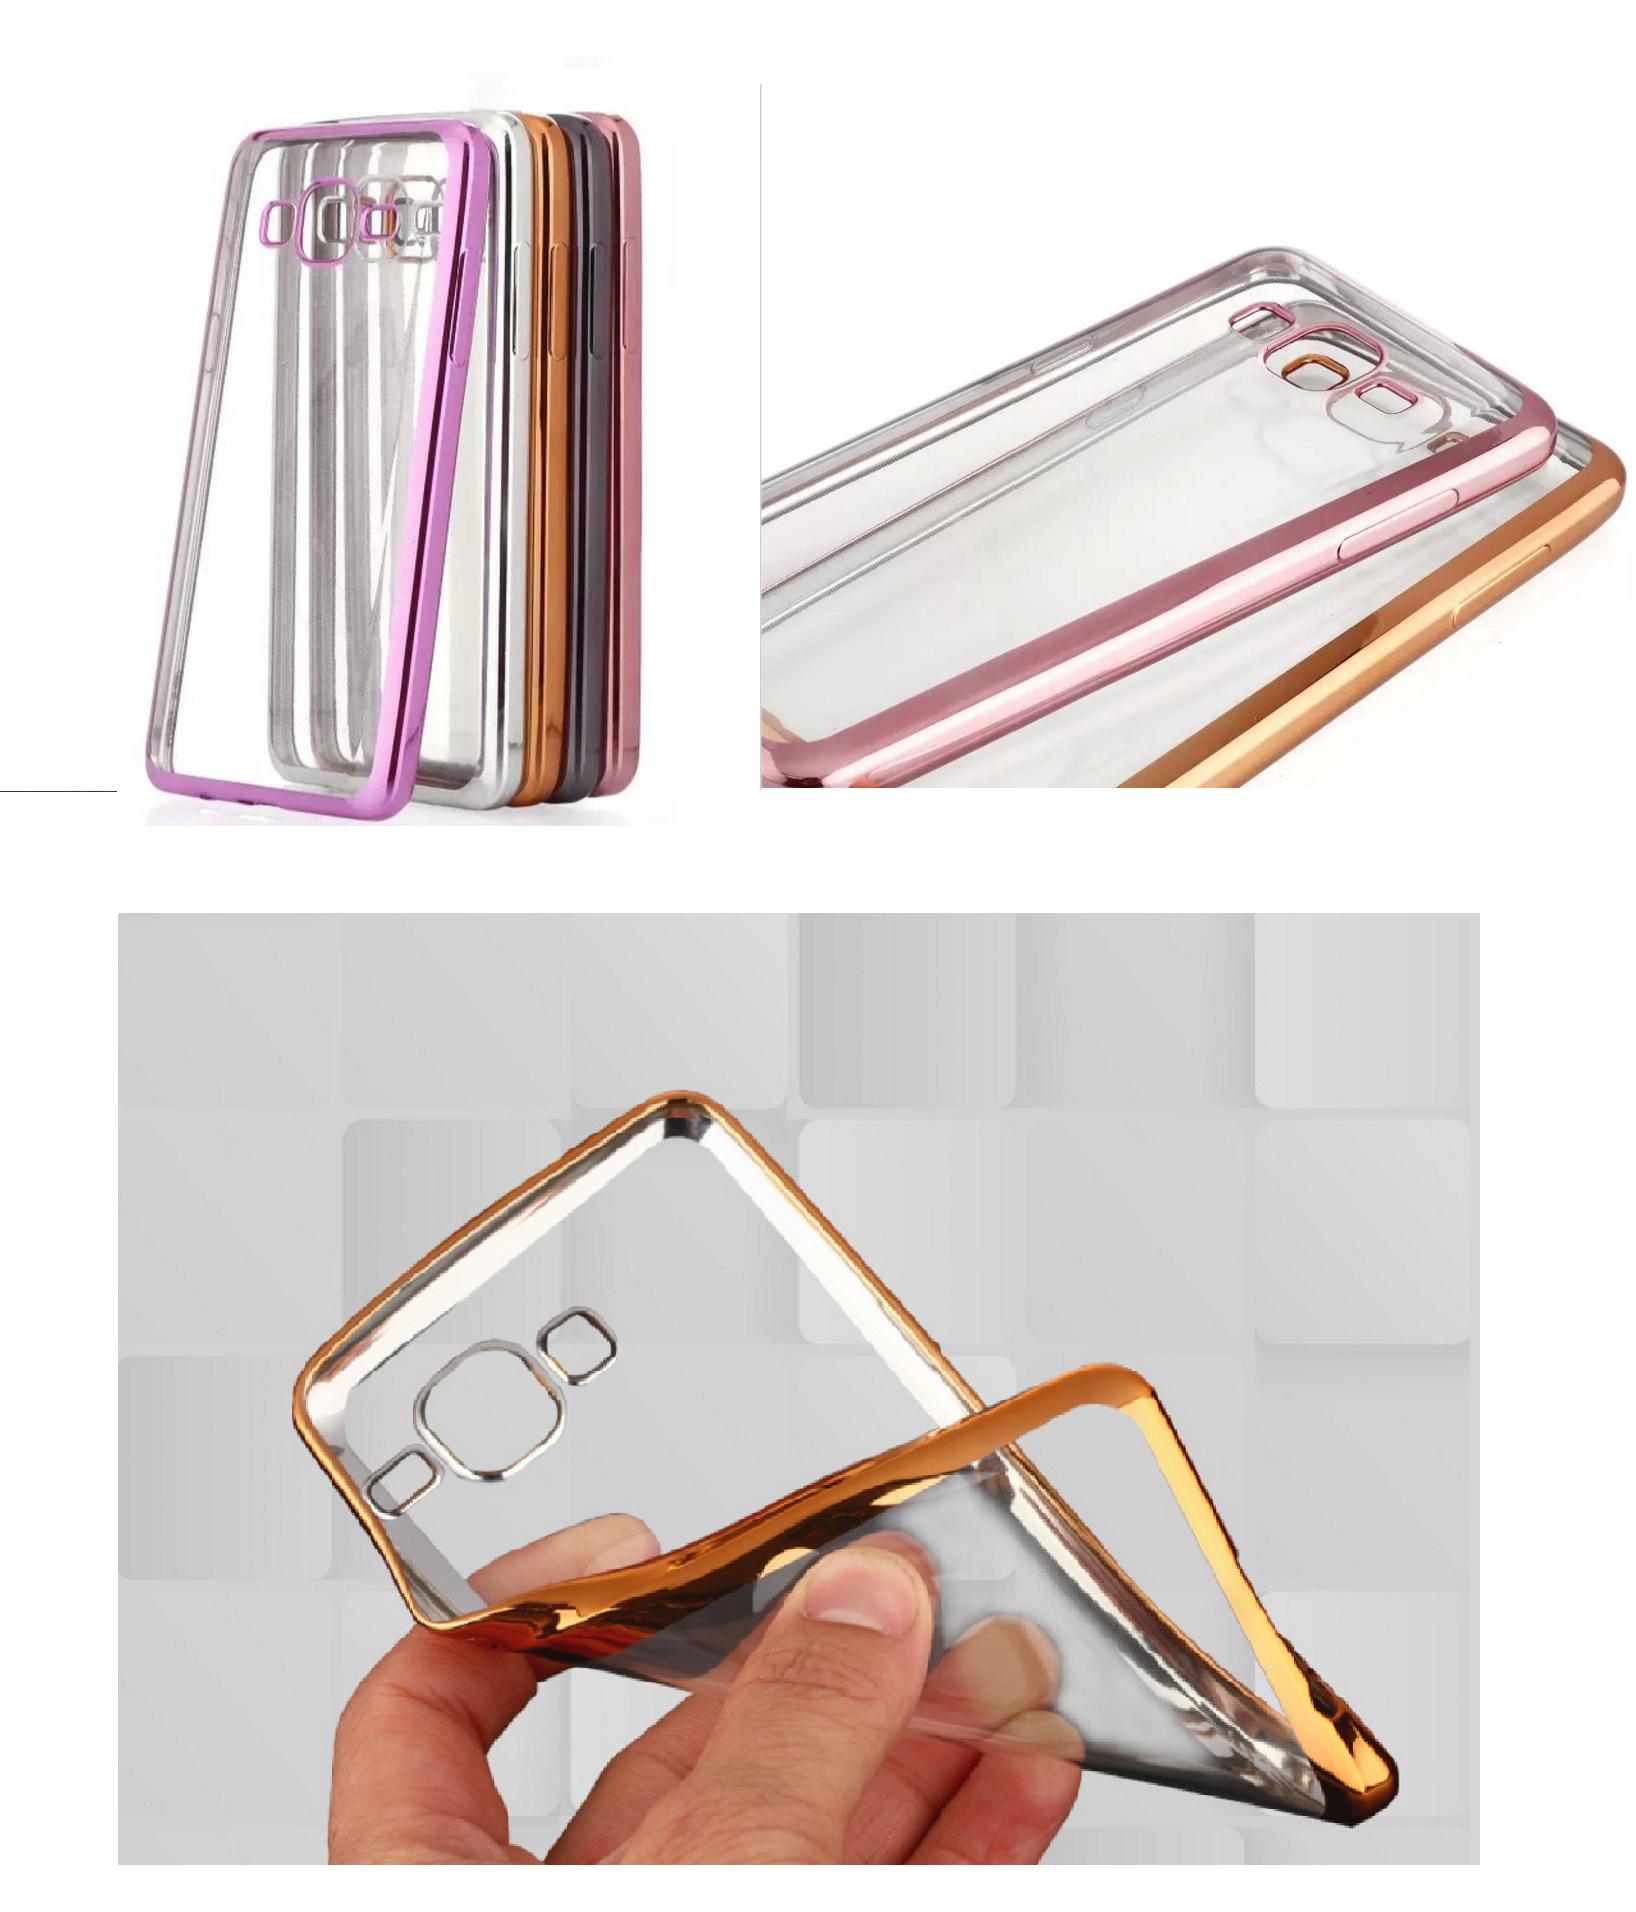 Jual Samsung Galaxy J7 TPU Shining Bumper Transparan Soft Case Cover Casing - Murah Cell Kudus | Tokopedia